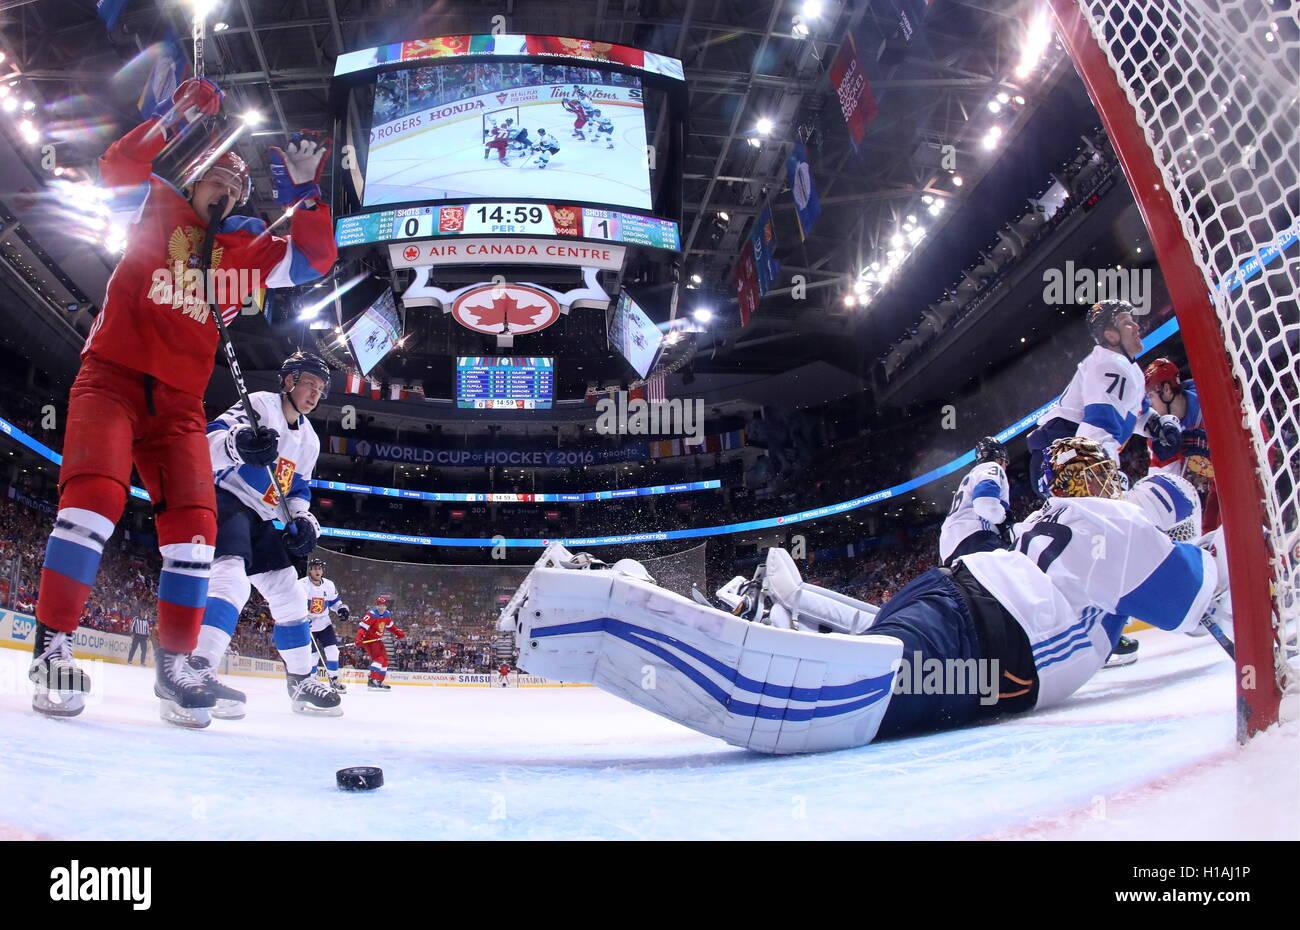 TORONTO, CANADA – SEPTEMBER 22, 2016: Finland's goalie Tuukka Rask (R) concedes a goal in the2016 World Cup - Stock Image